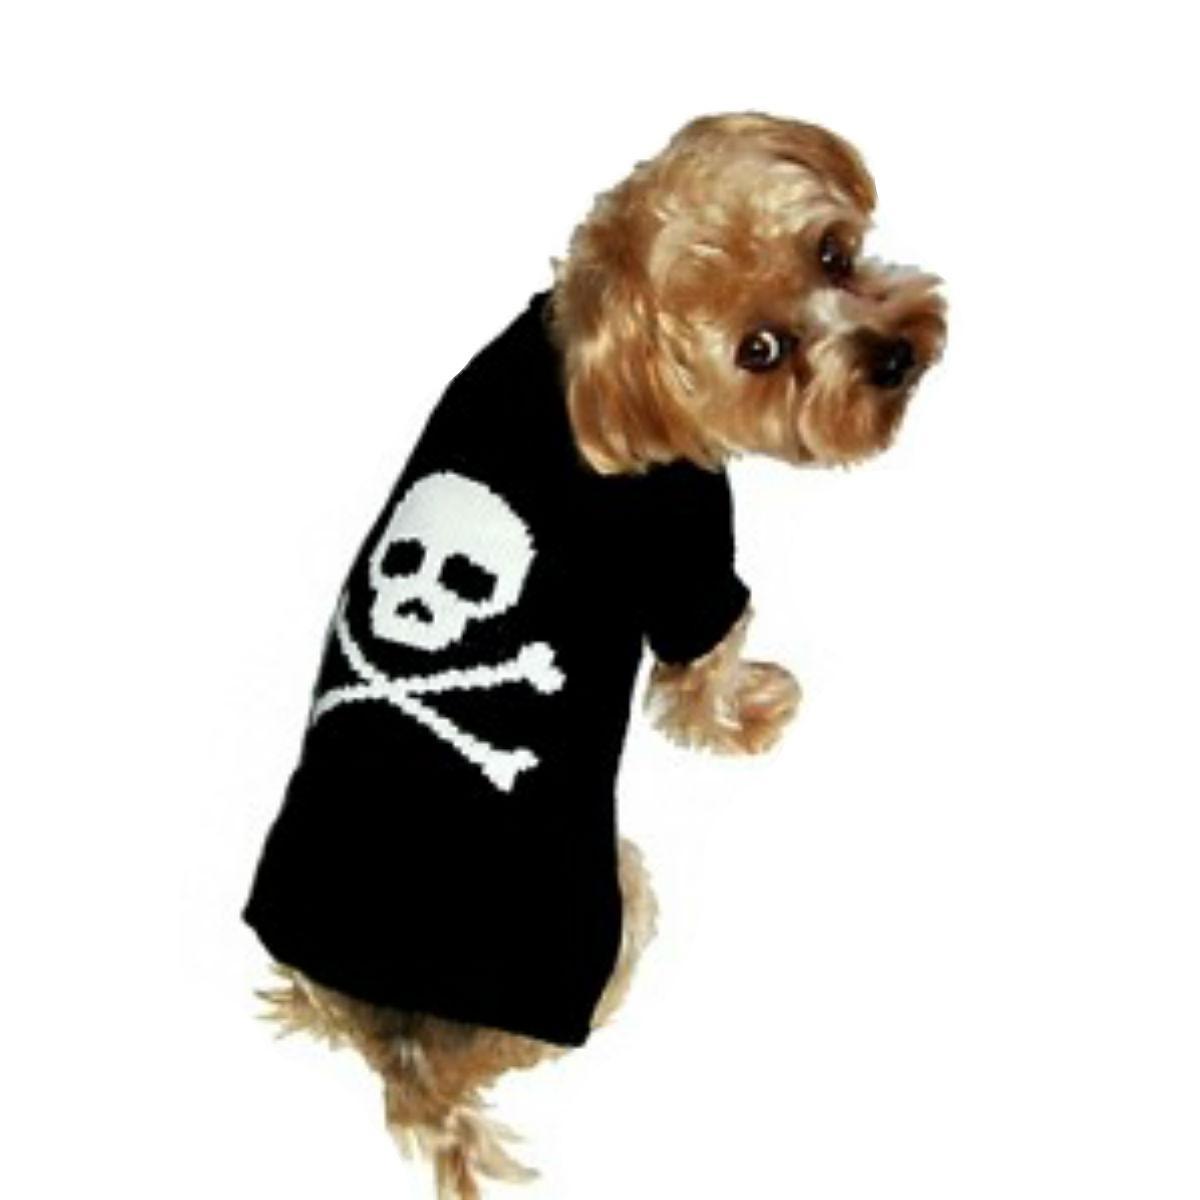 Dallas Dogs Jolly Roger Dog Sweater - Boy